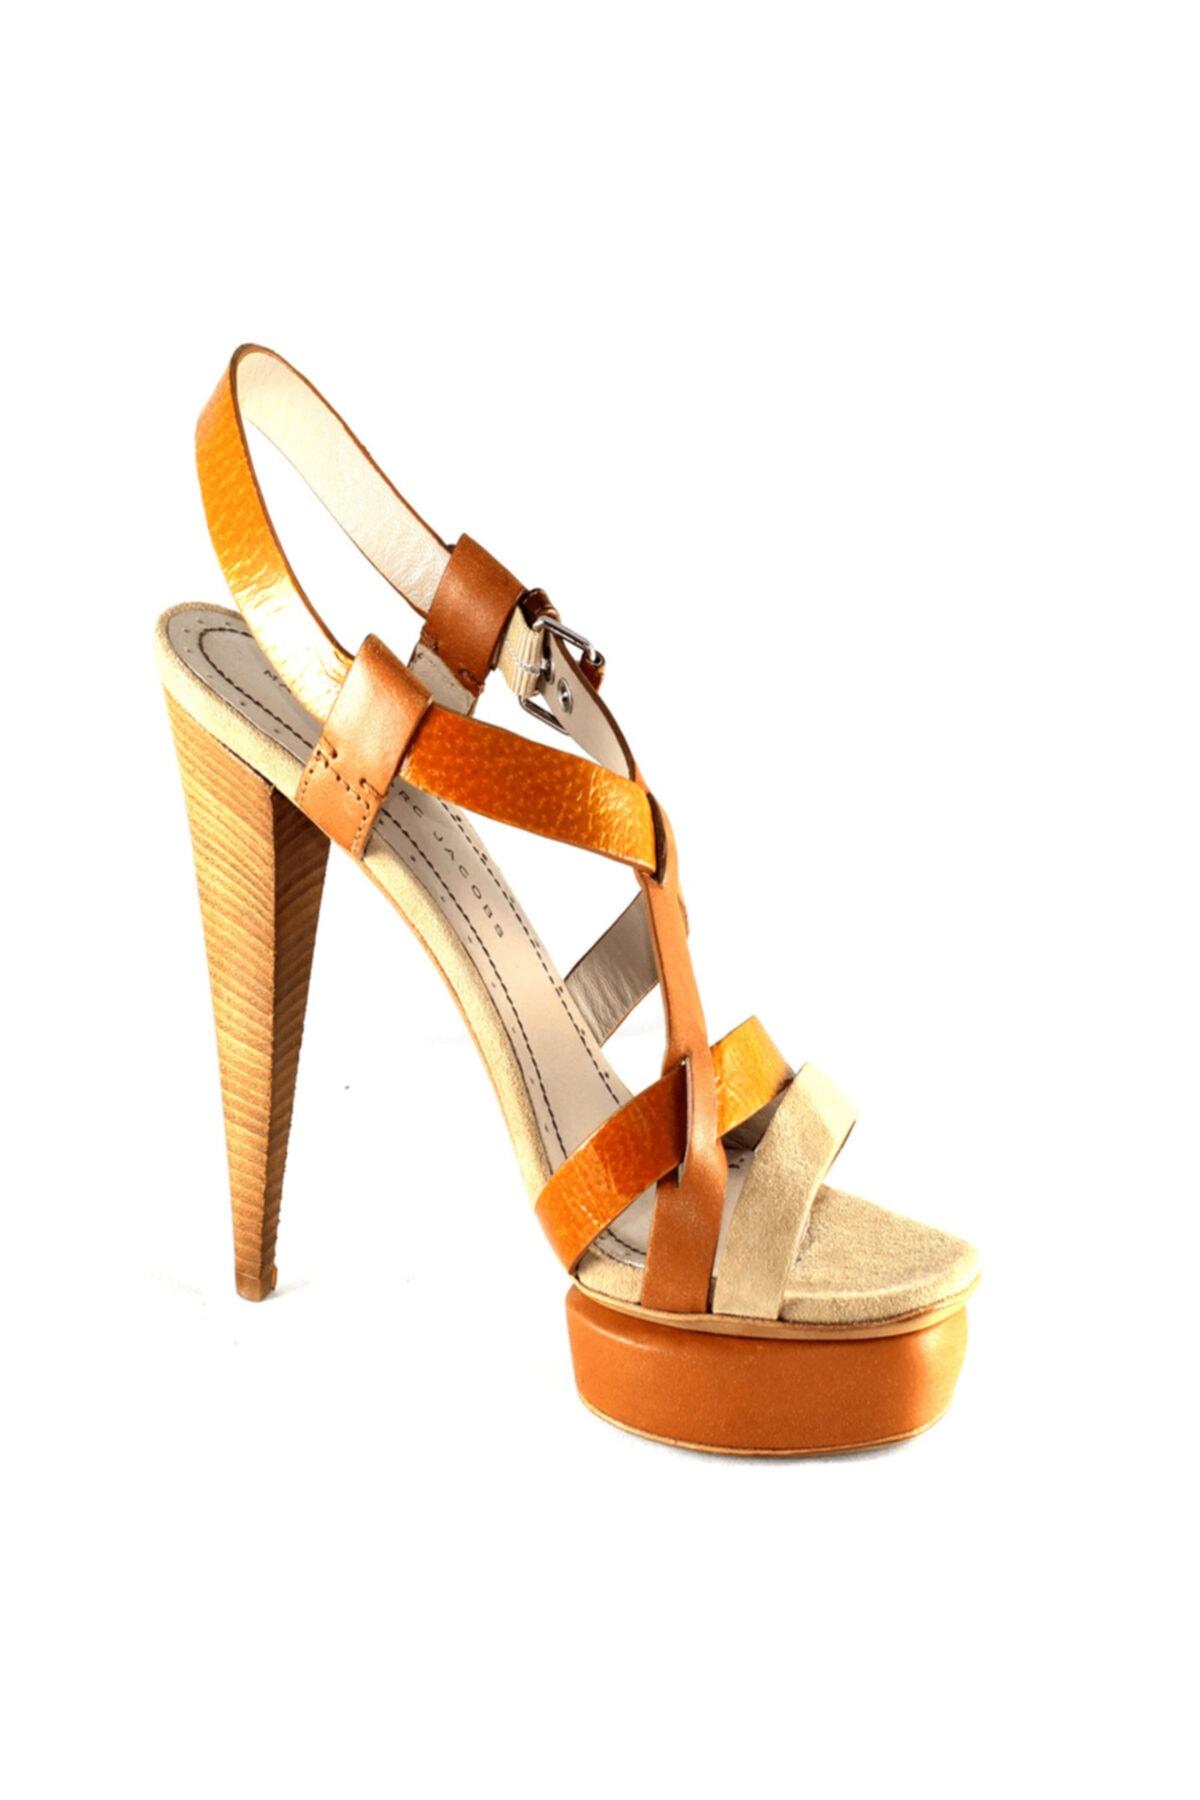 Marc Jacobs Kadın Topuklu Sandalet Viski Rengi 615977 1